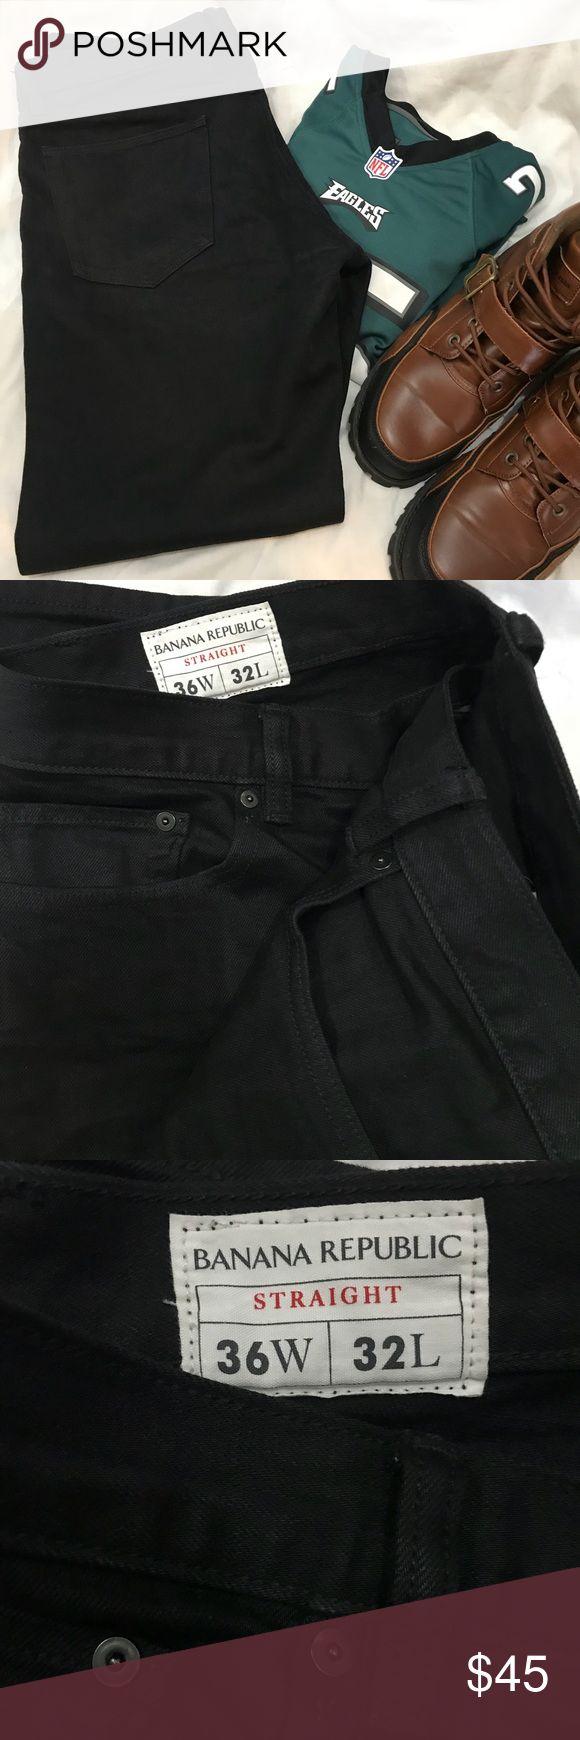 Men's Banana Republic Jeans Men's blackest black jeans. Straight. Size 36Wx32L. Like new condition. Banana Republic Jeans Straight